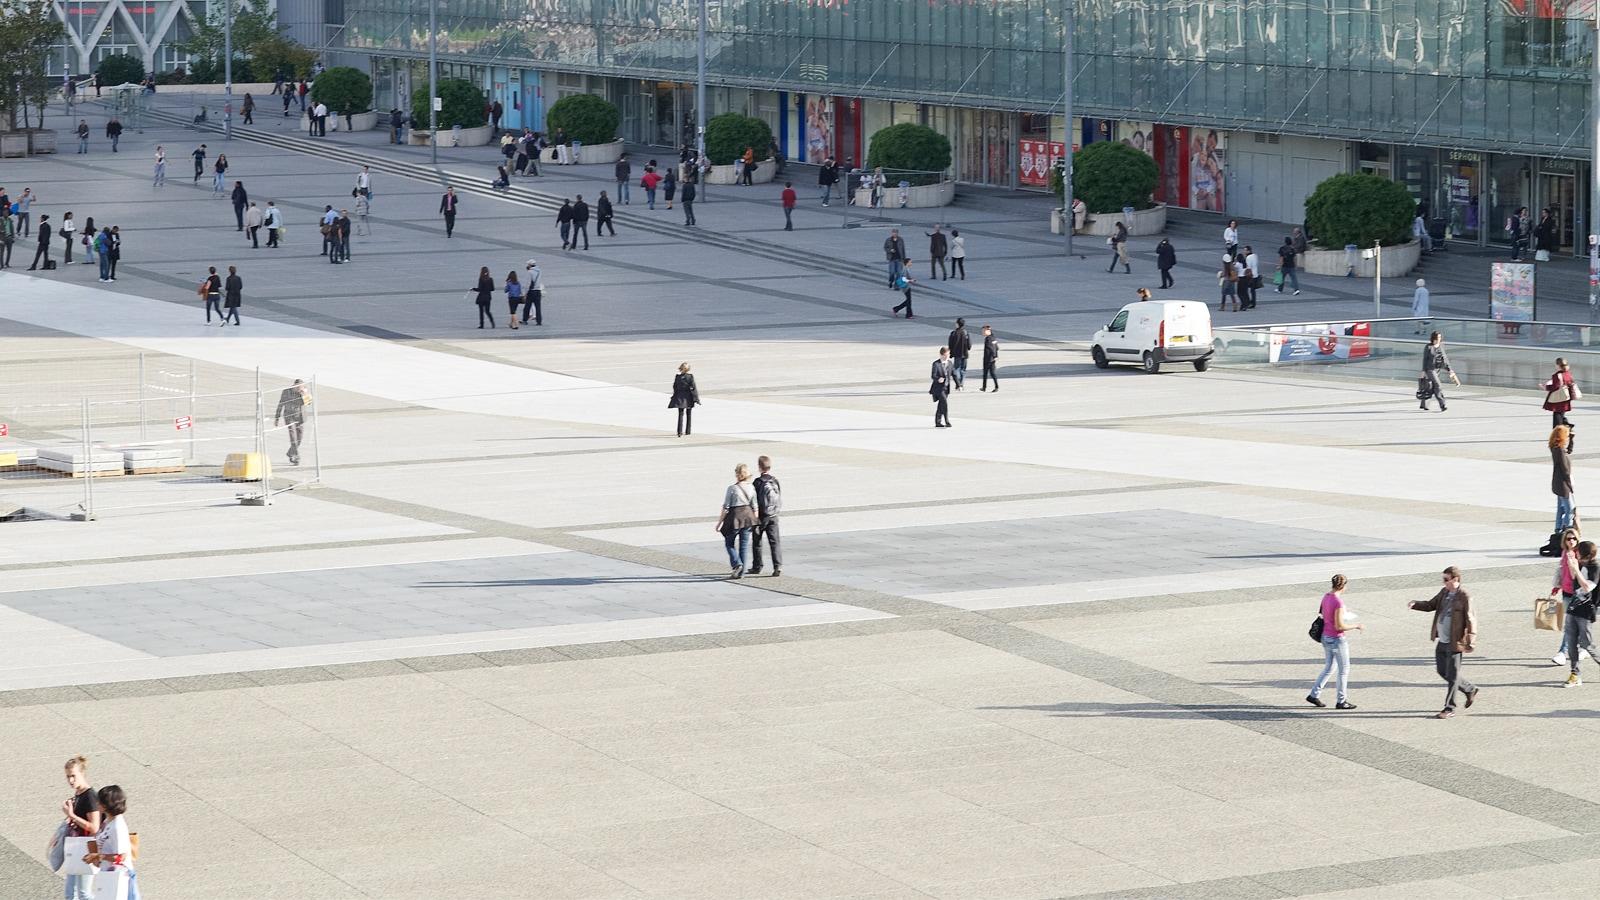 Pwc espa a auditor a consultor a tax legal services - Method homes espana ...